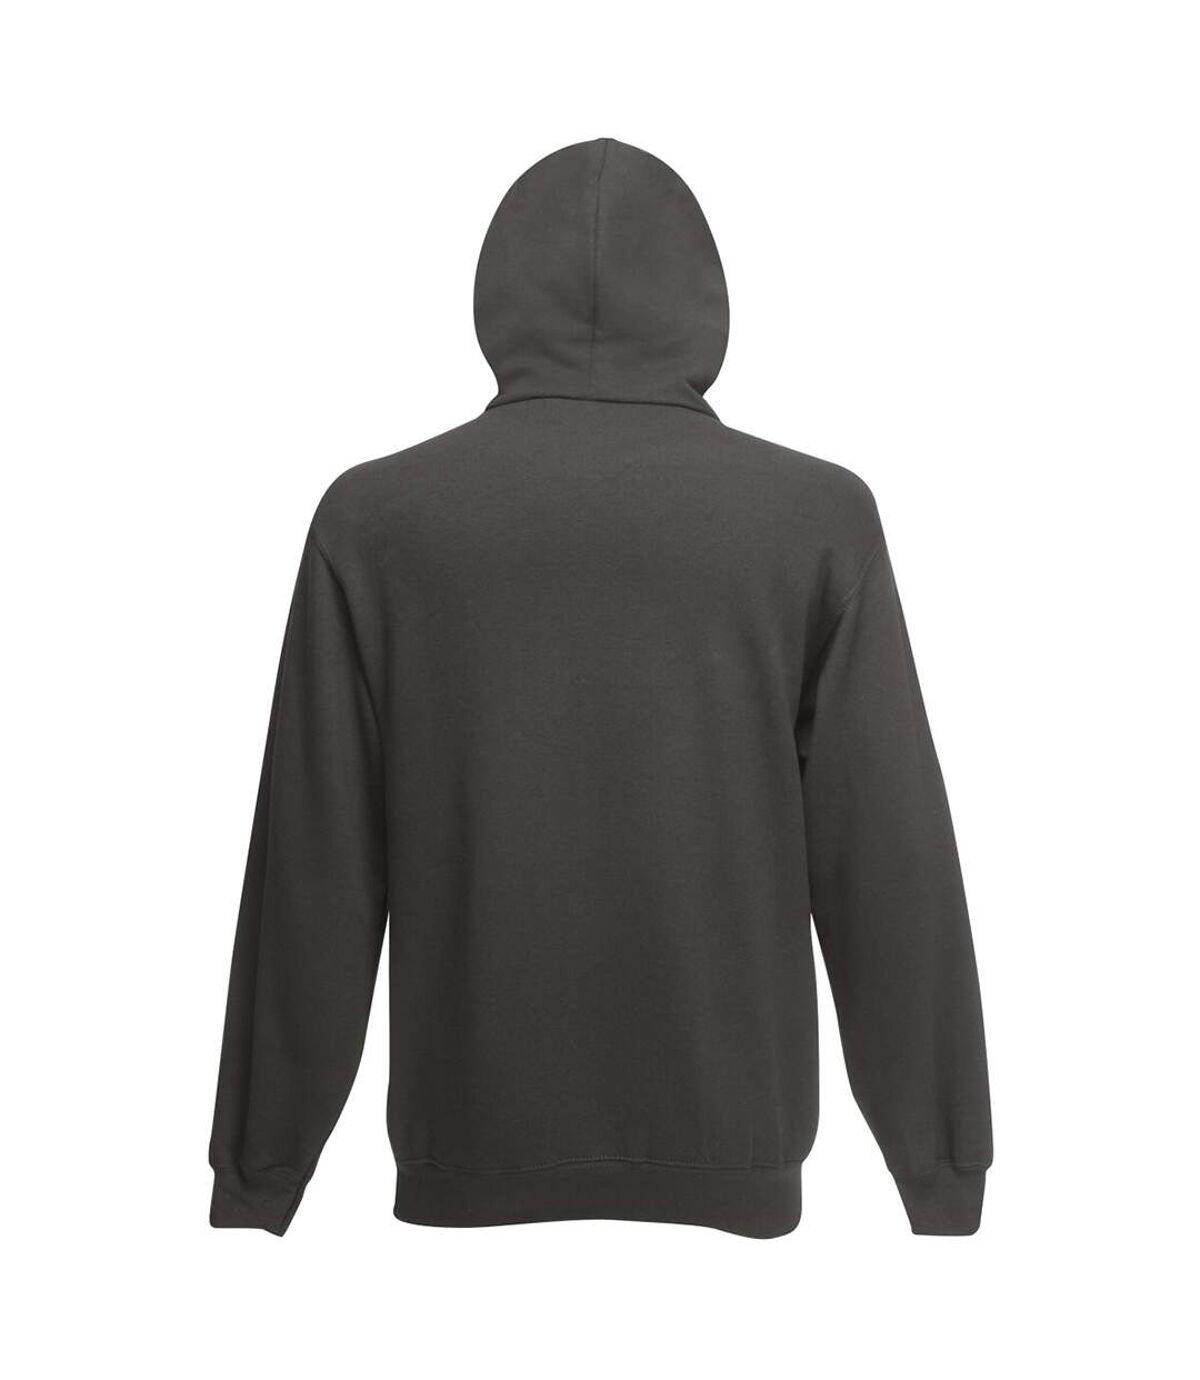 Fruit Of The Loom Mens Hooded Sweatshirt (Light Graphite) - UTBC1369